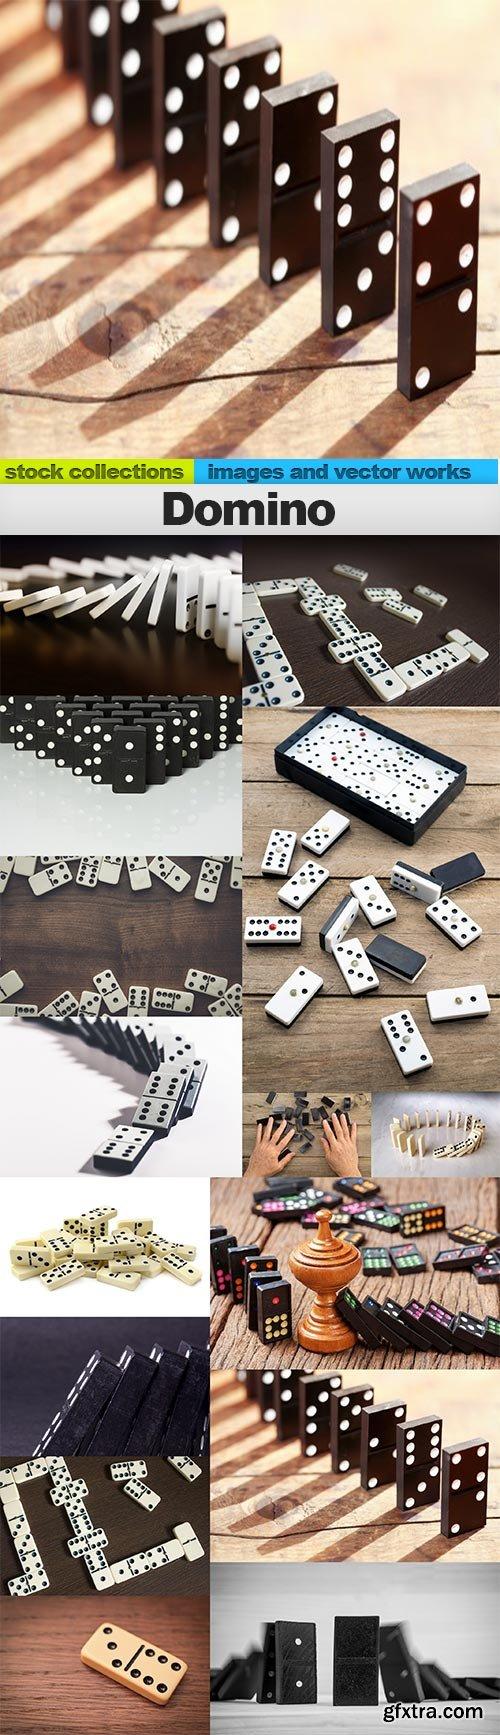 Domino, 15 x UHQ JPEG